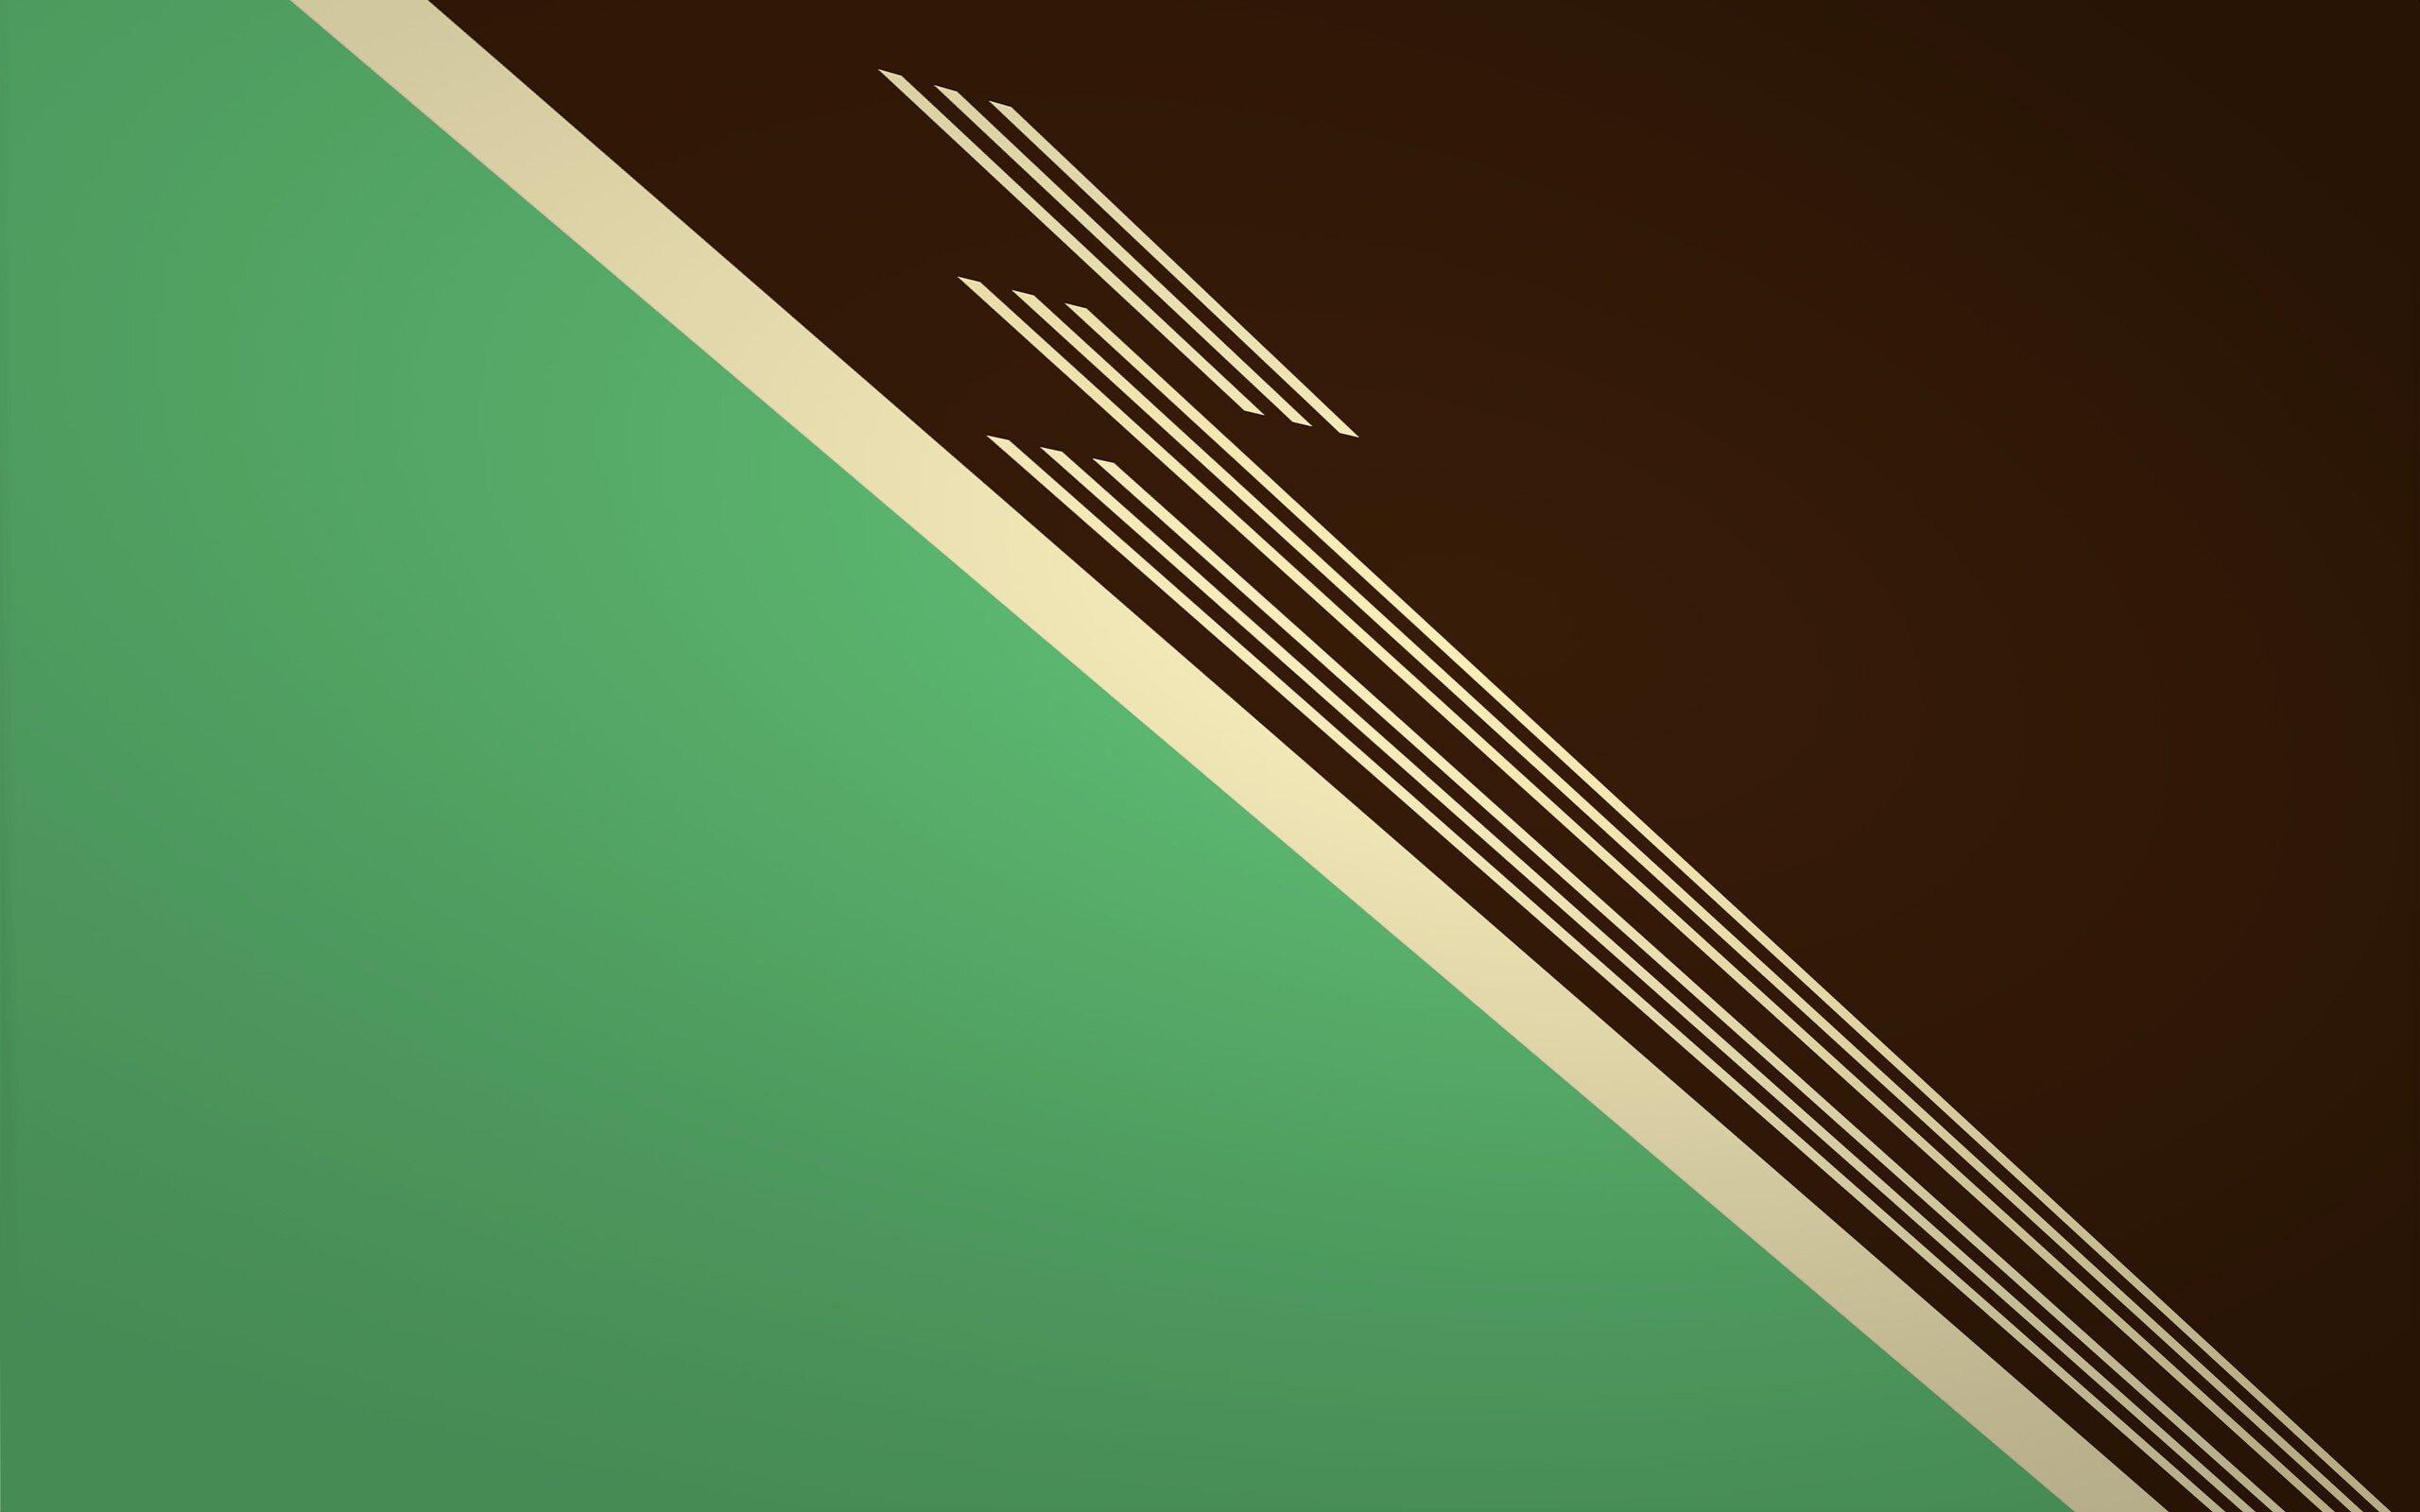 radiohead wallpaper iphone 5